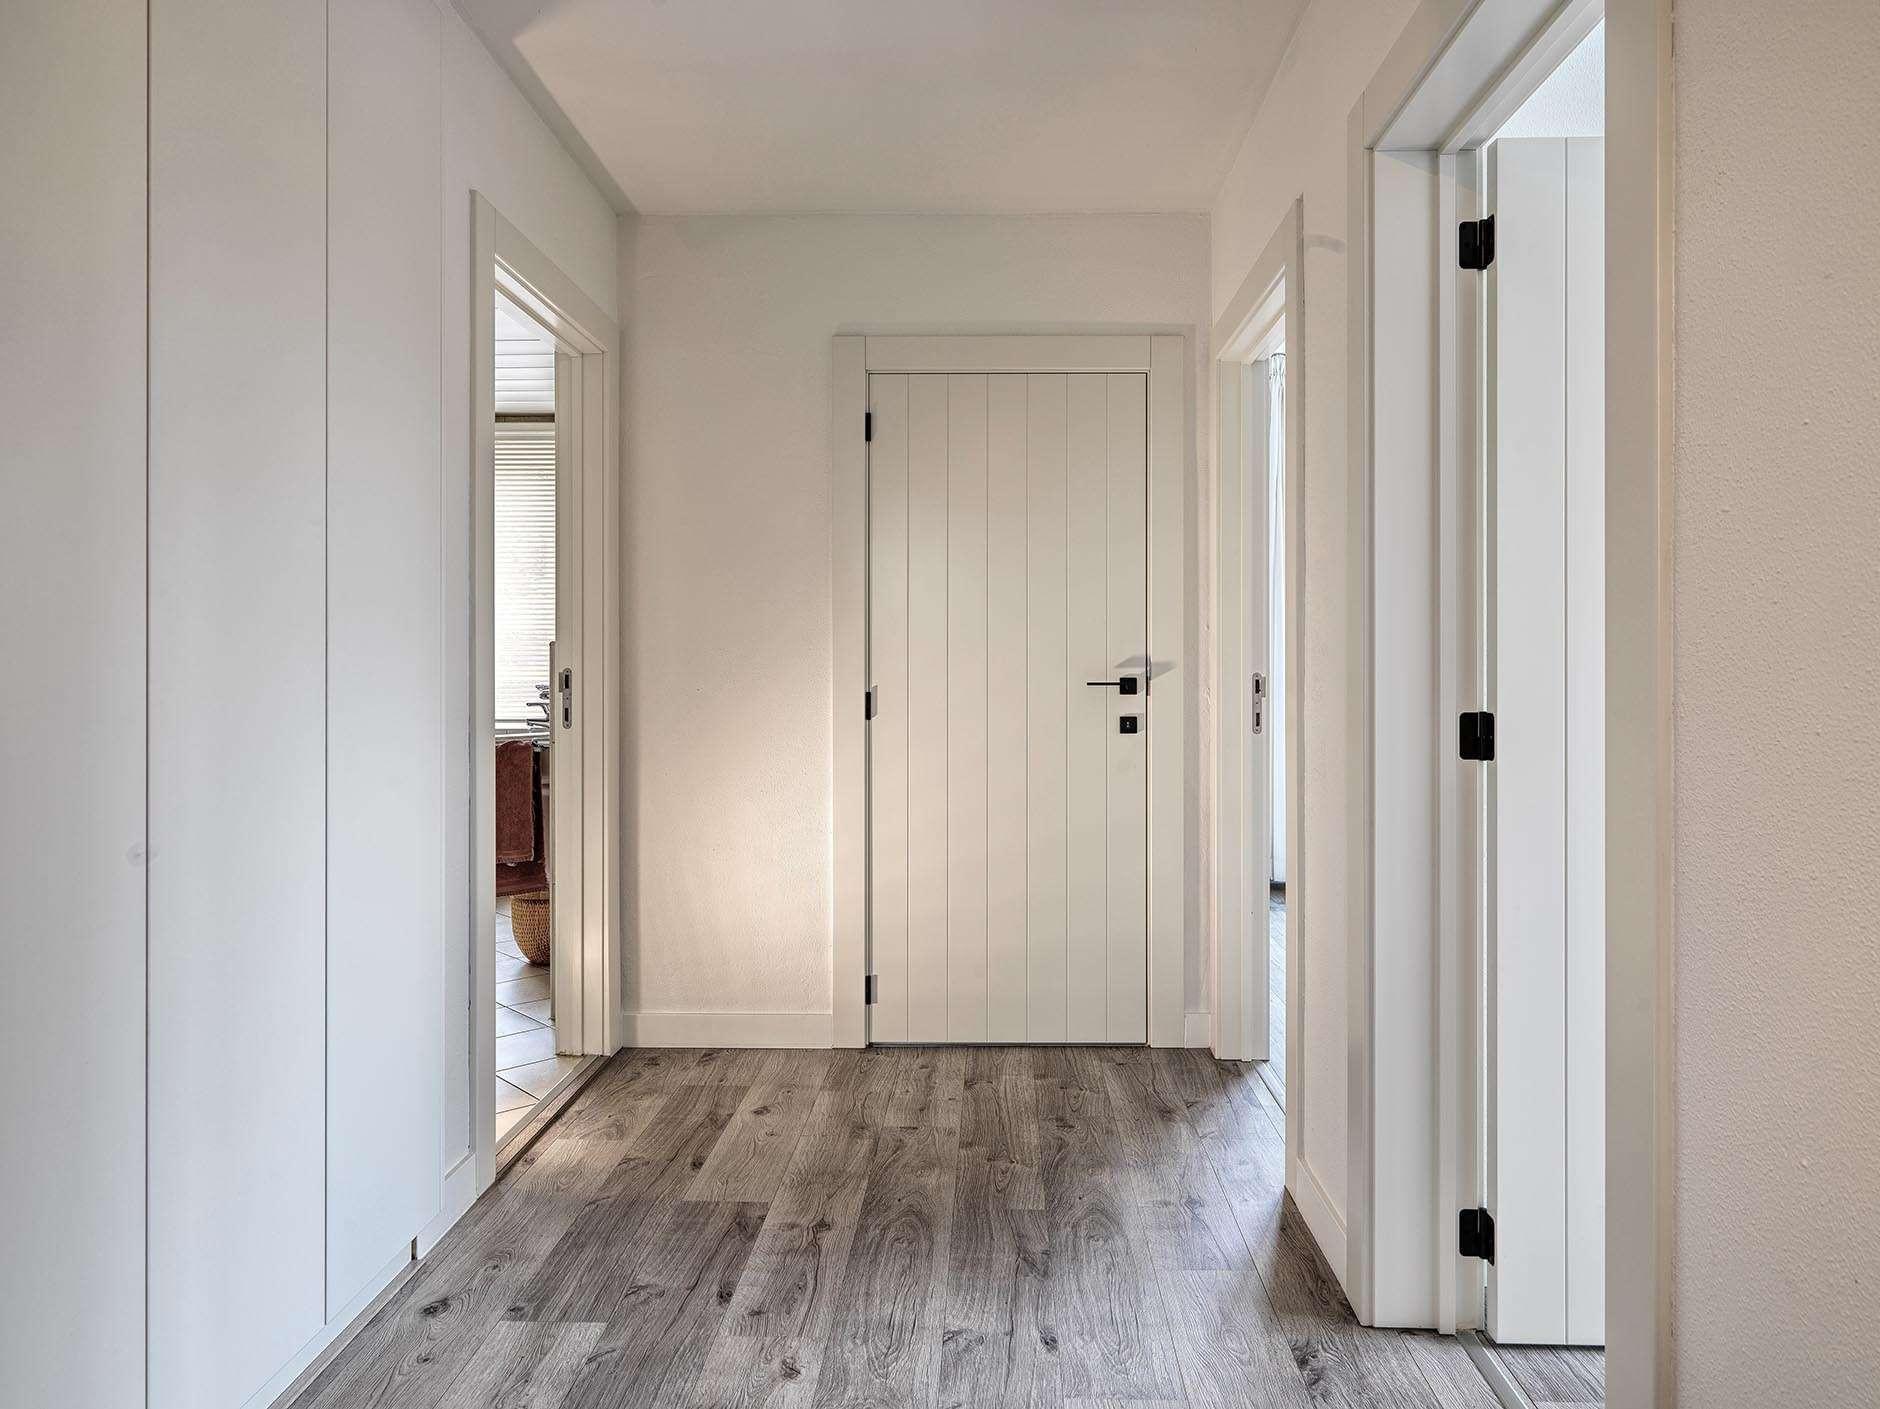 binnendeuren-wit-zwarte-klink-modern-landelijk